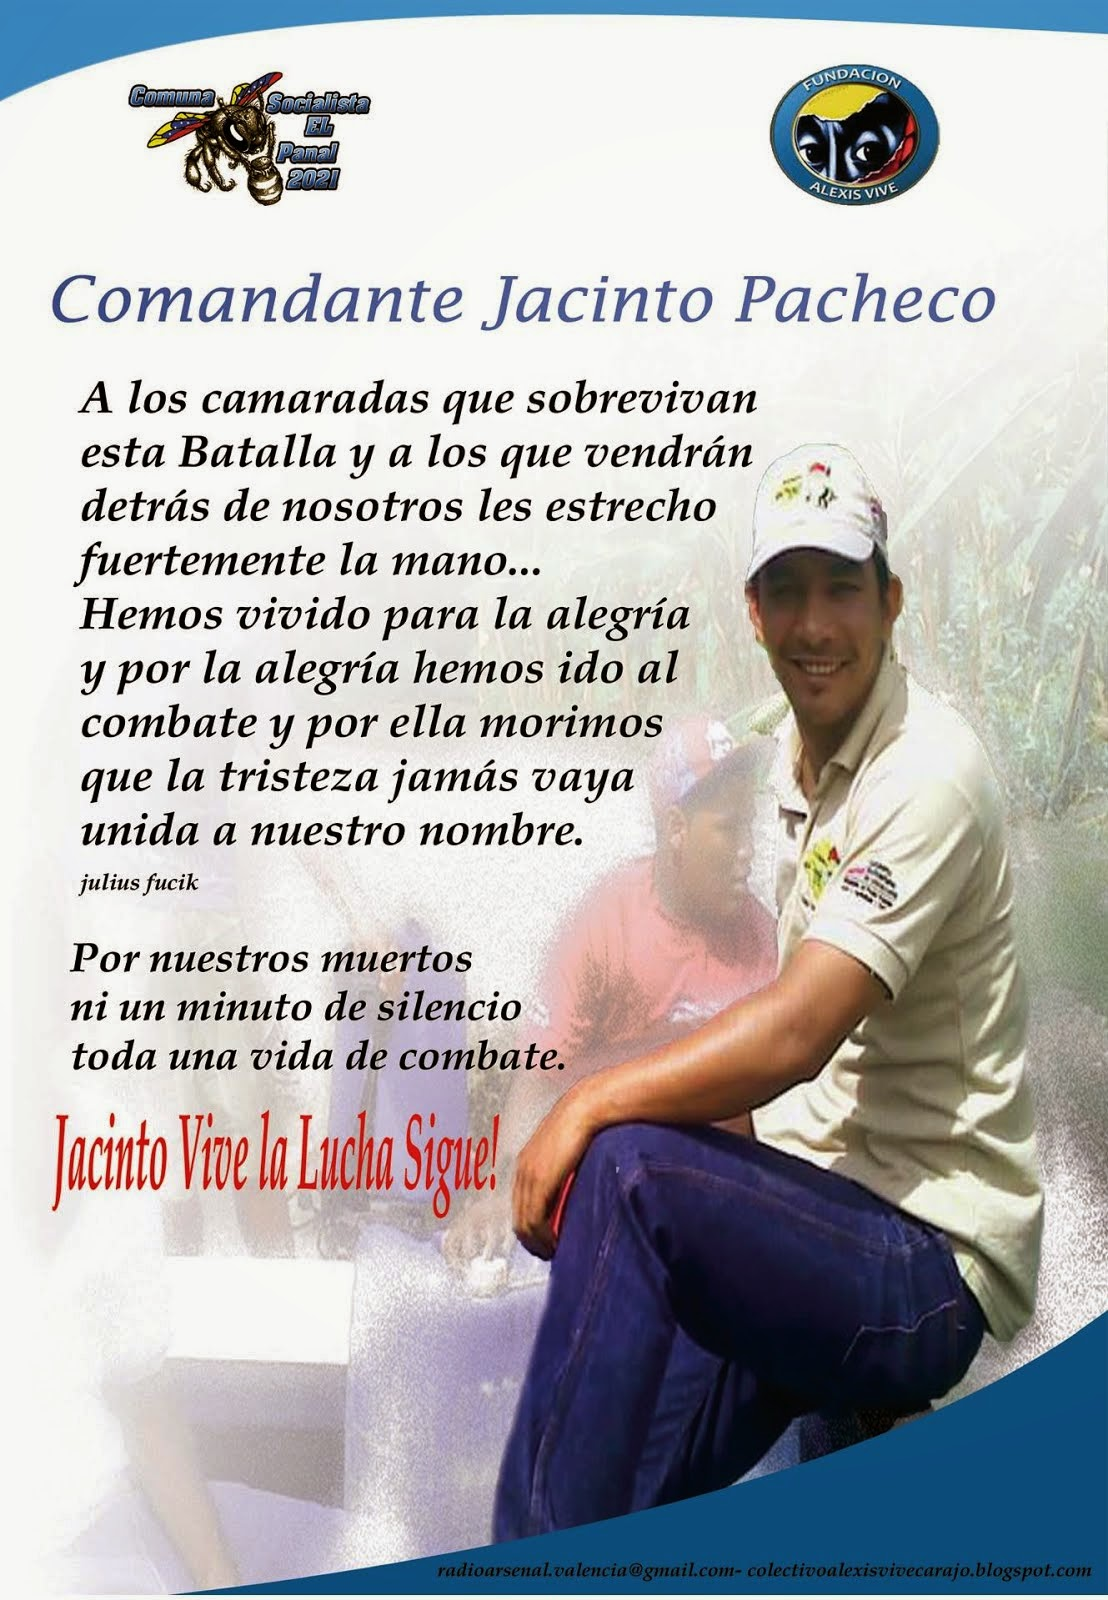 Comandante Jacinto Pacheco